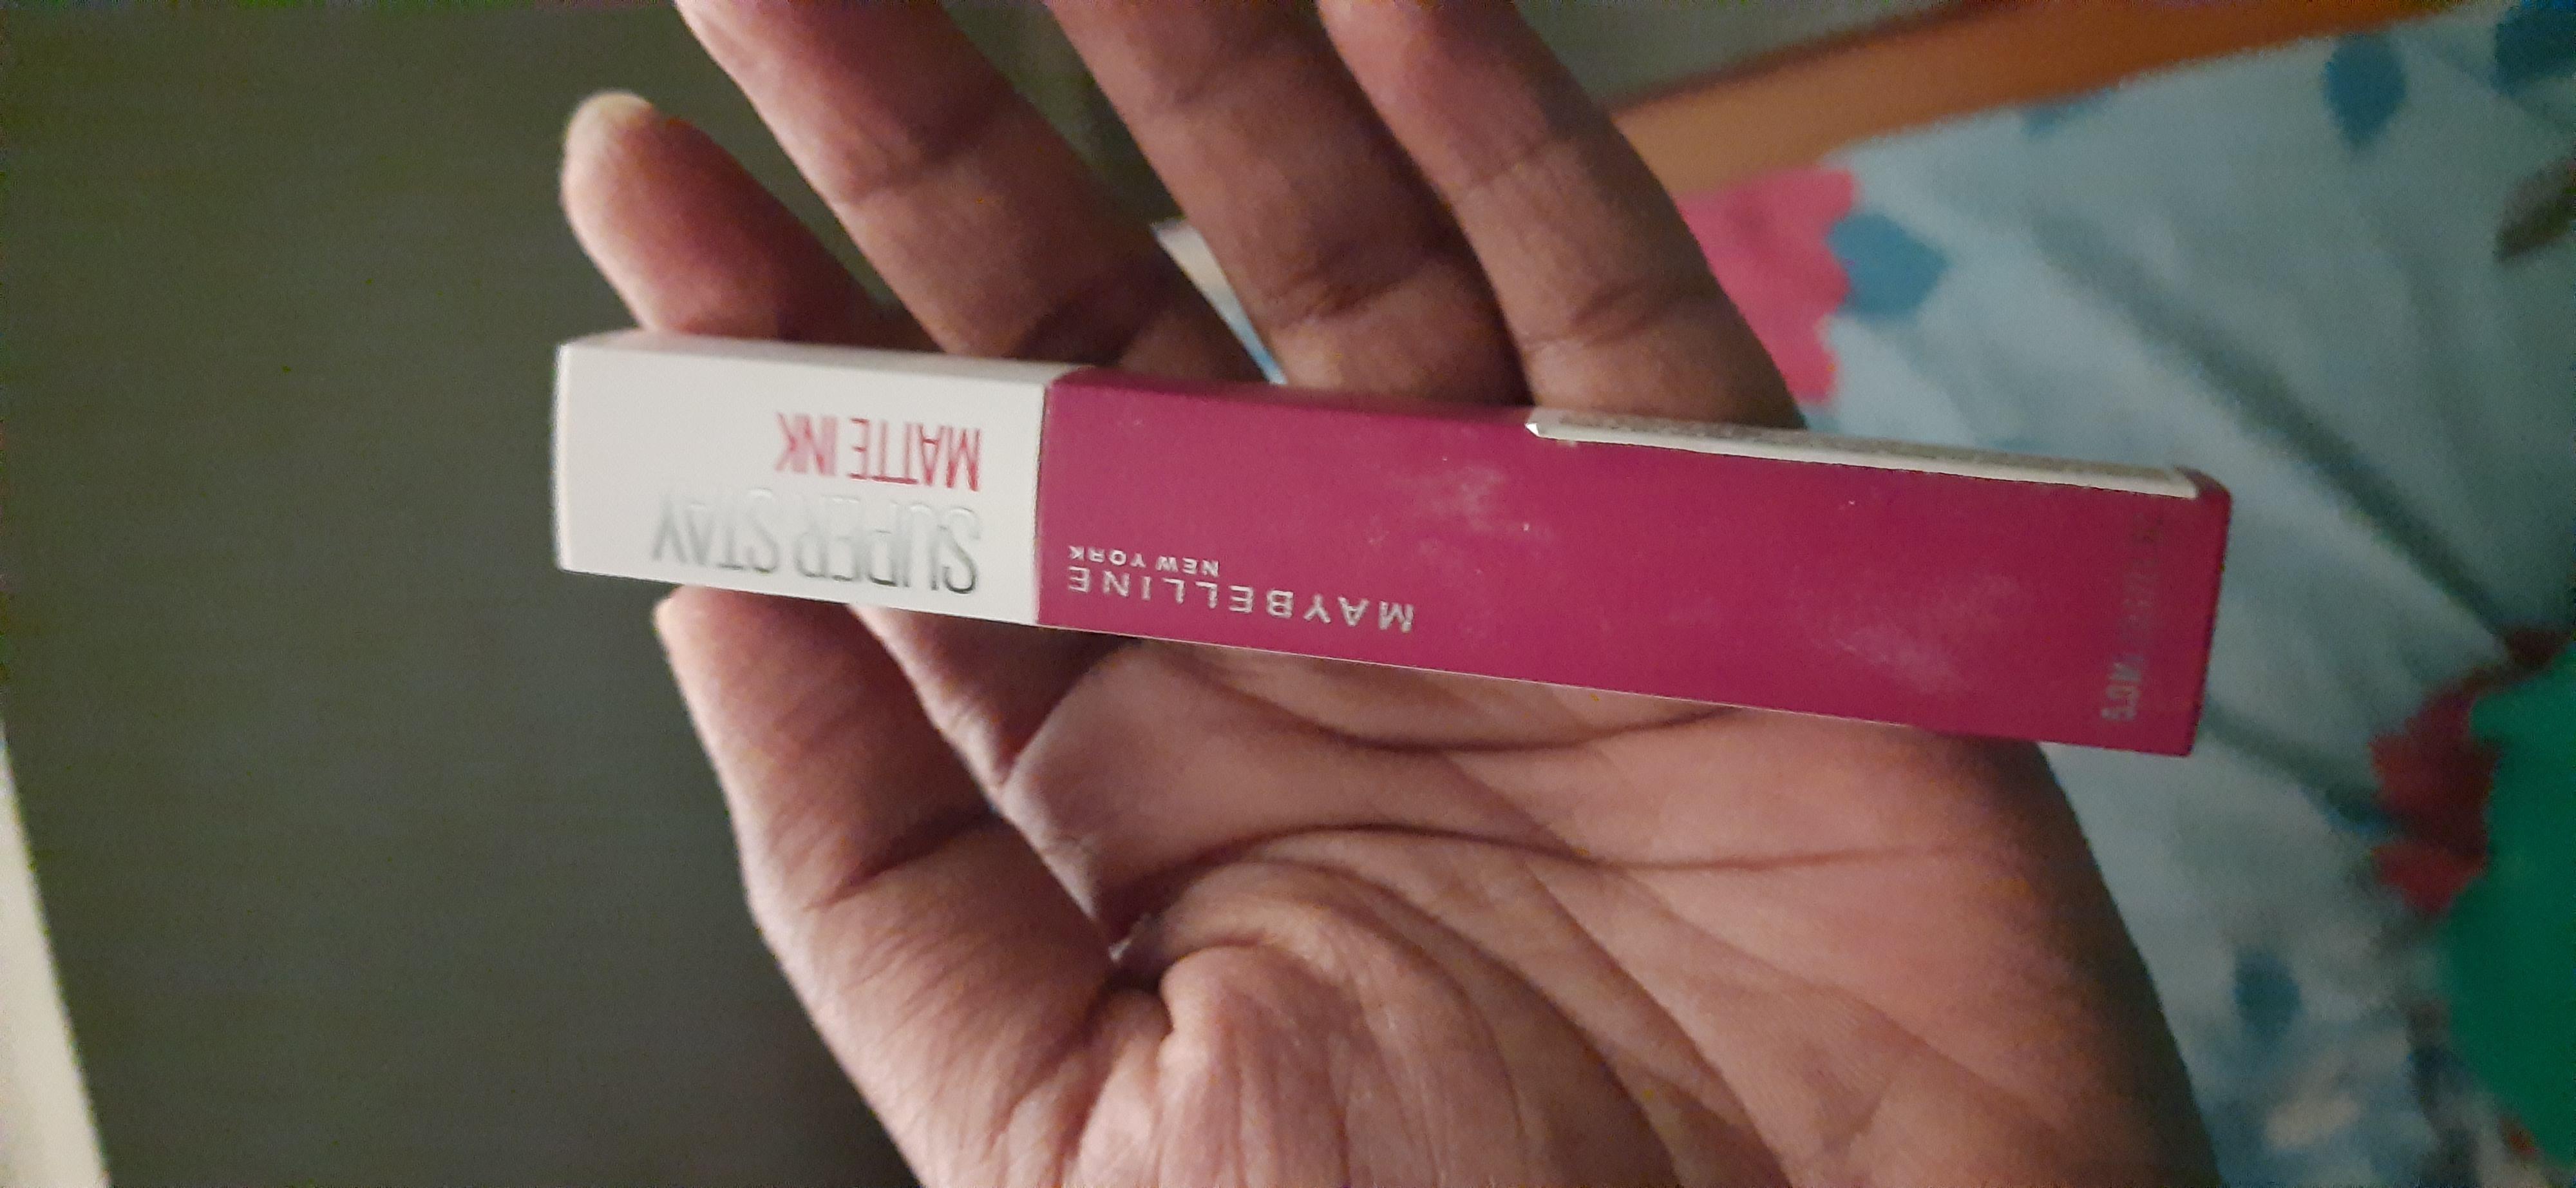 Maybelline New York Superstay Matte Ink Liquid Lipstick-Super stay….long last matte lipstick-By sonymuchapathii